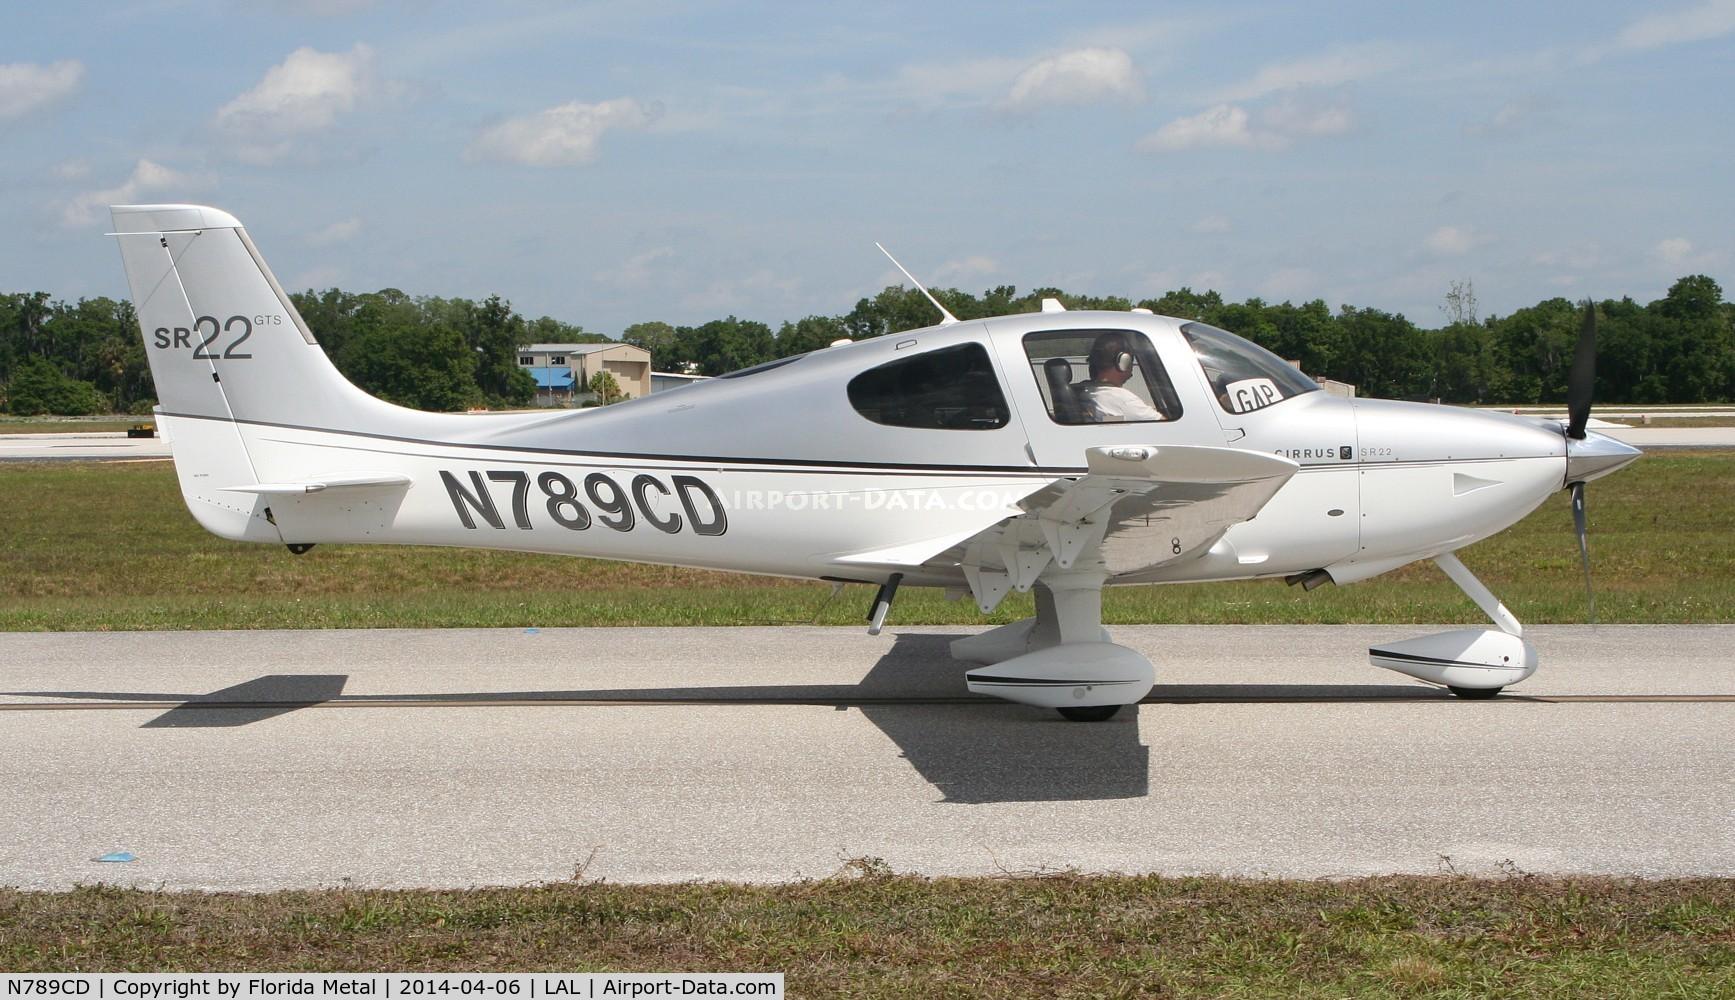 N789CD, Cirrus SR22 GTS C/N 3567, Cirrus SR22